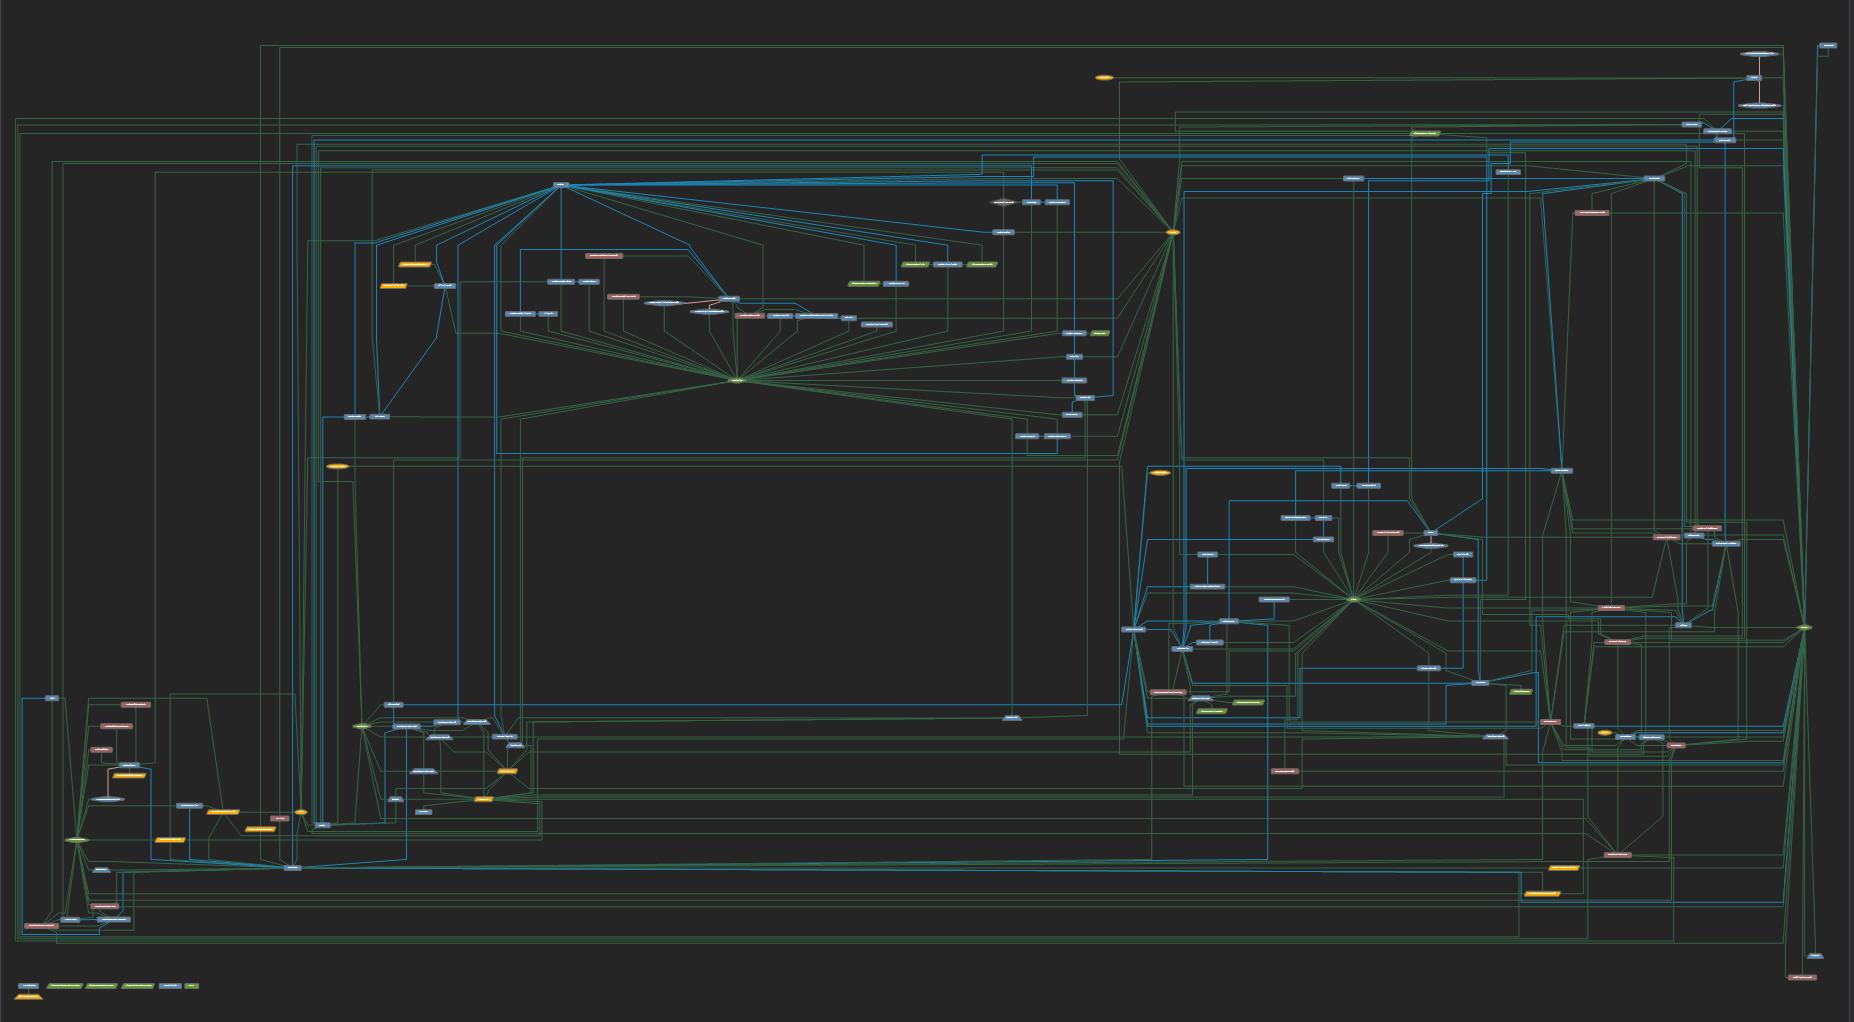 adventureworks 2012 diagram thermostat wiring for electric furnace microsoft sql server historical sample database tour